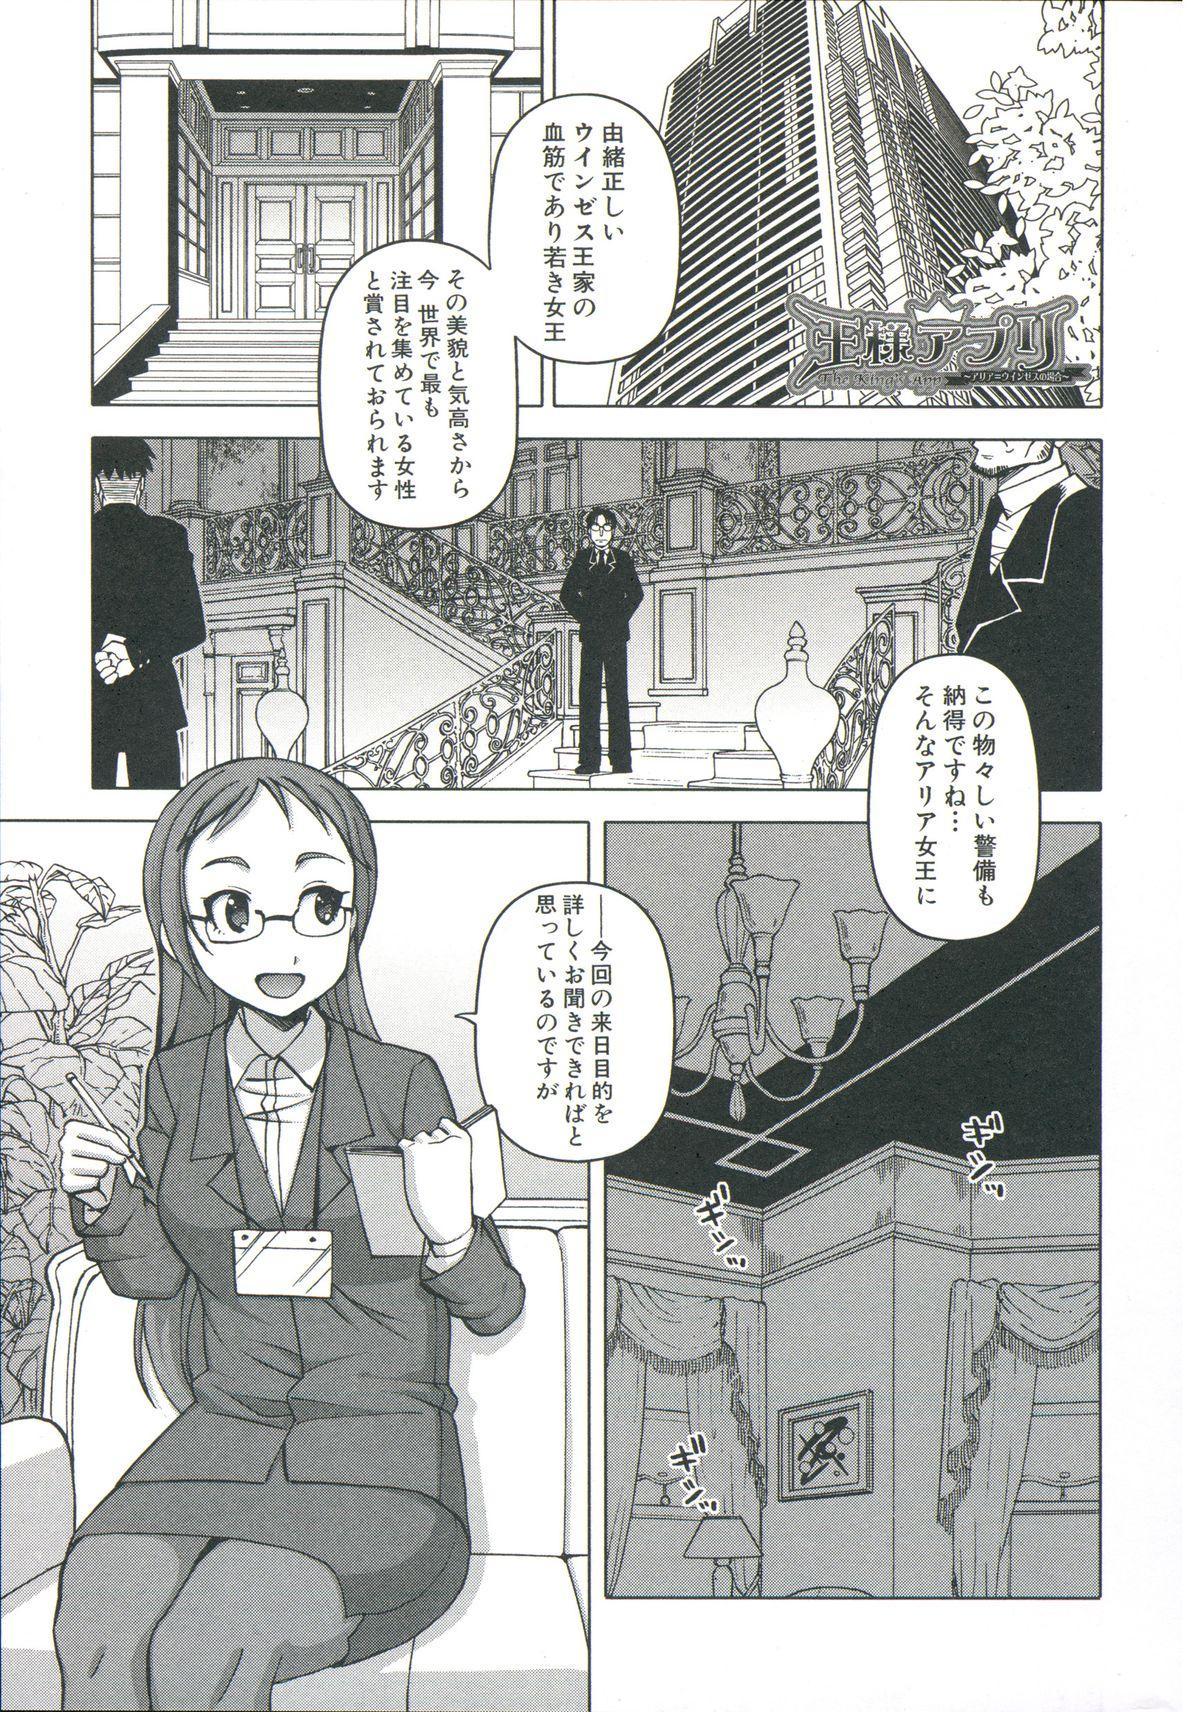 [Takatsu] Ou-sama Appli - King App 207